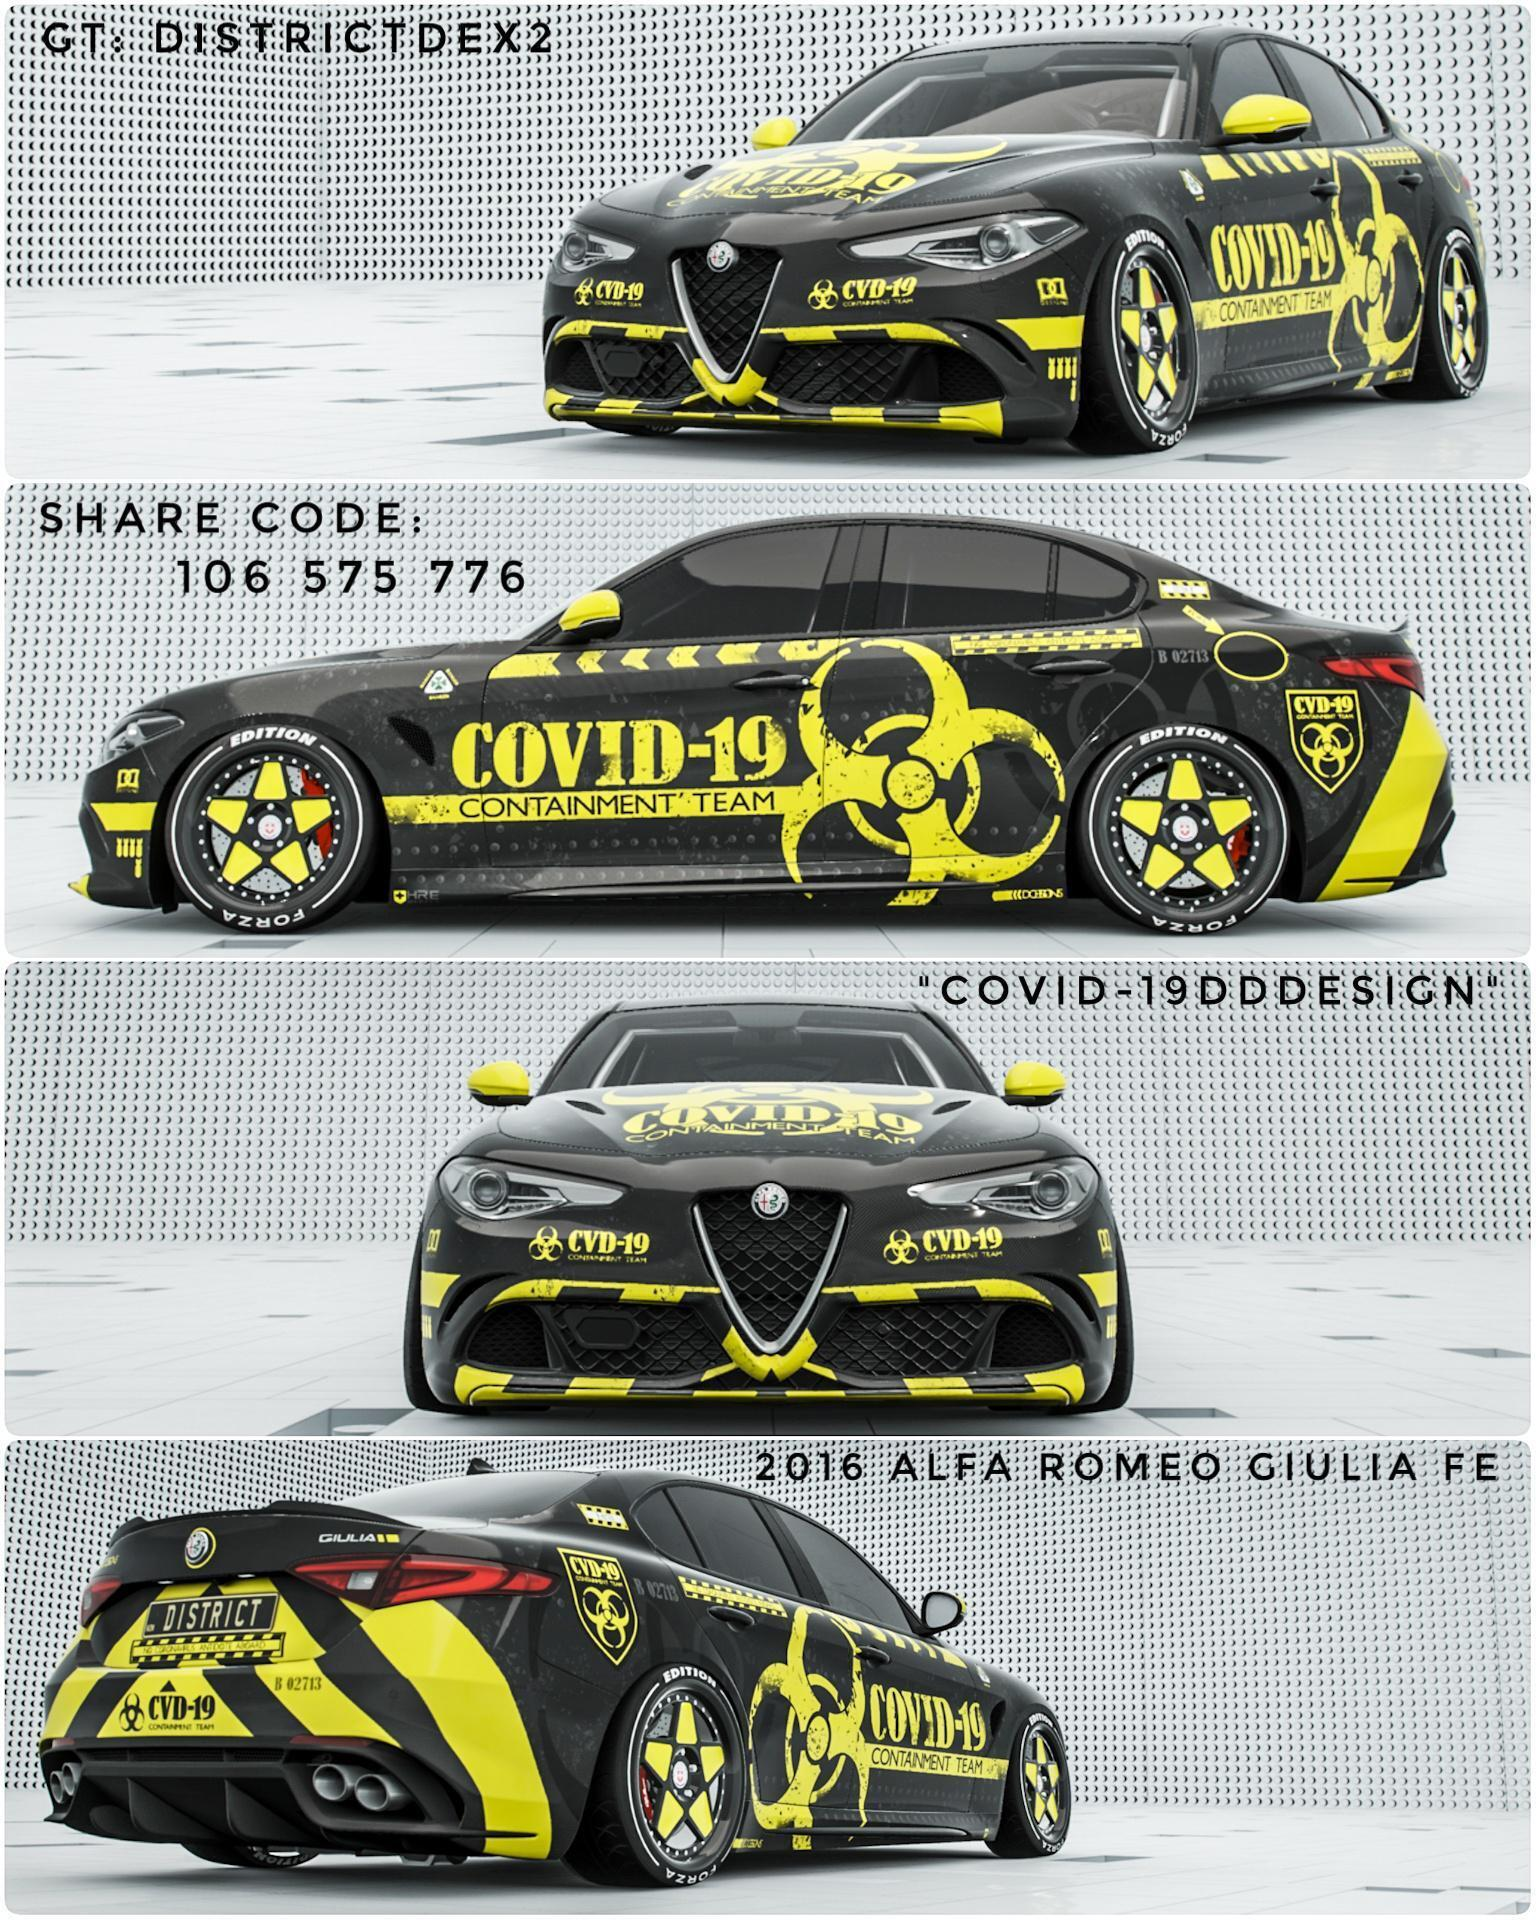 Alfa Romeo Giulia Forza Edition COVID-19